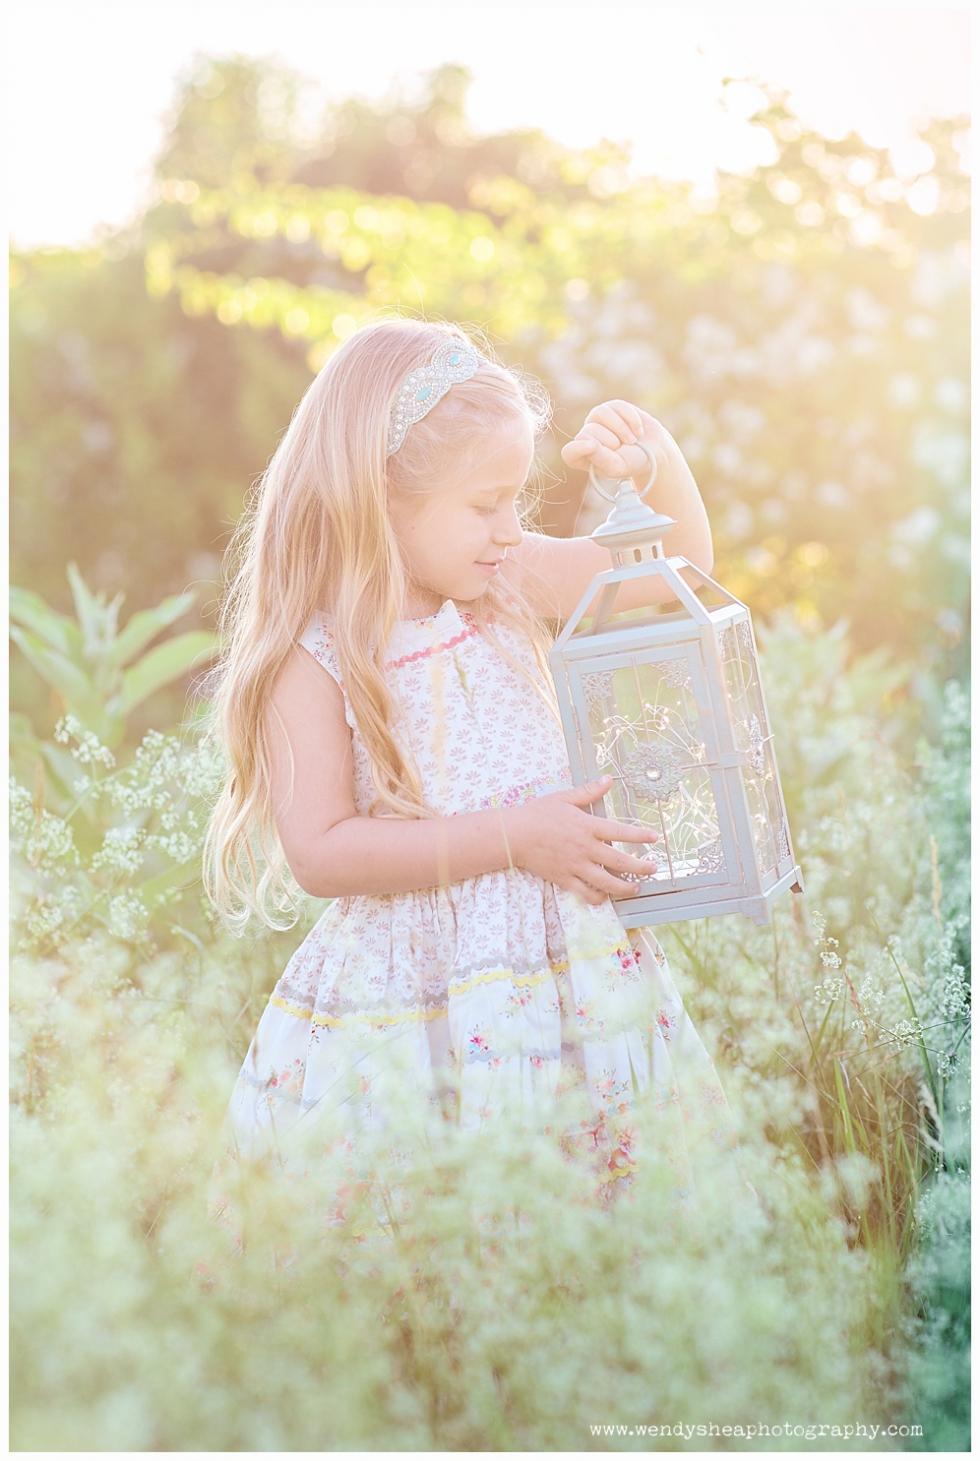 WendySheaPhotography_Massachusetts_Children_Photographer_0005